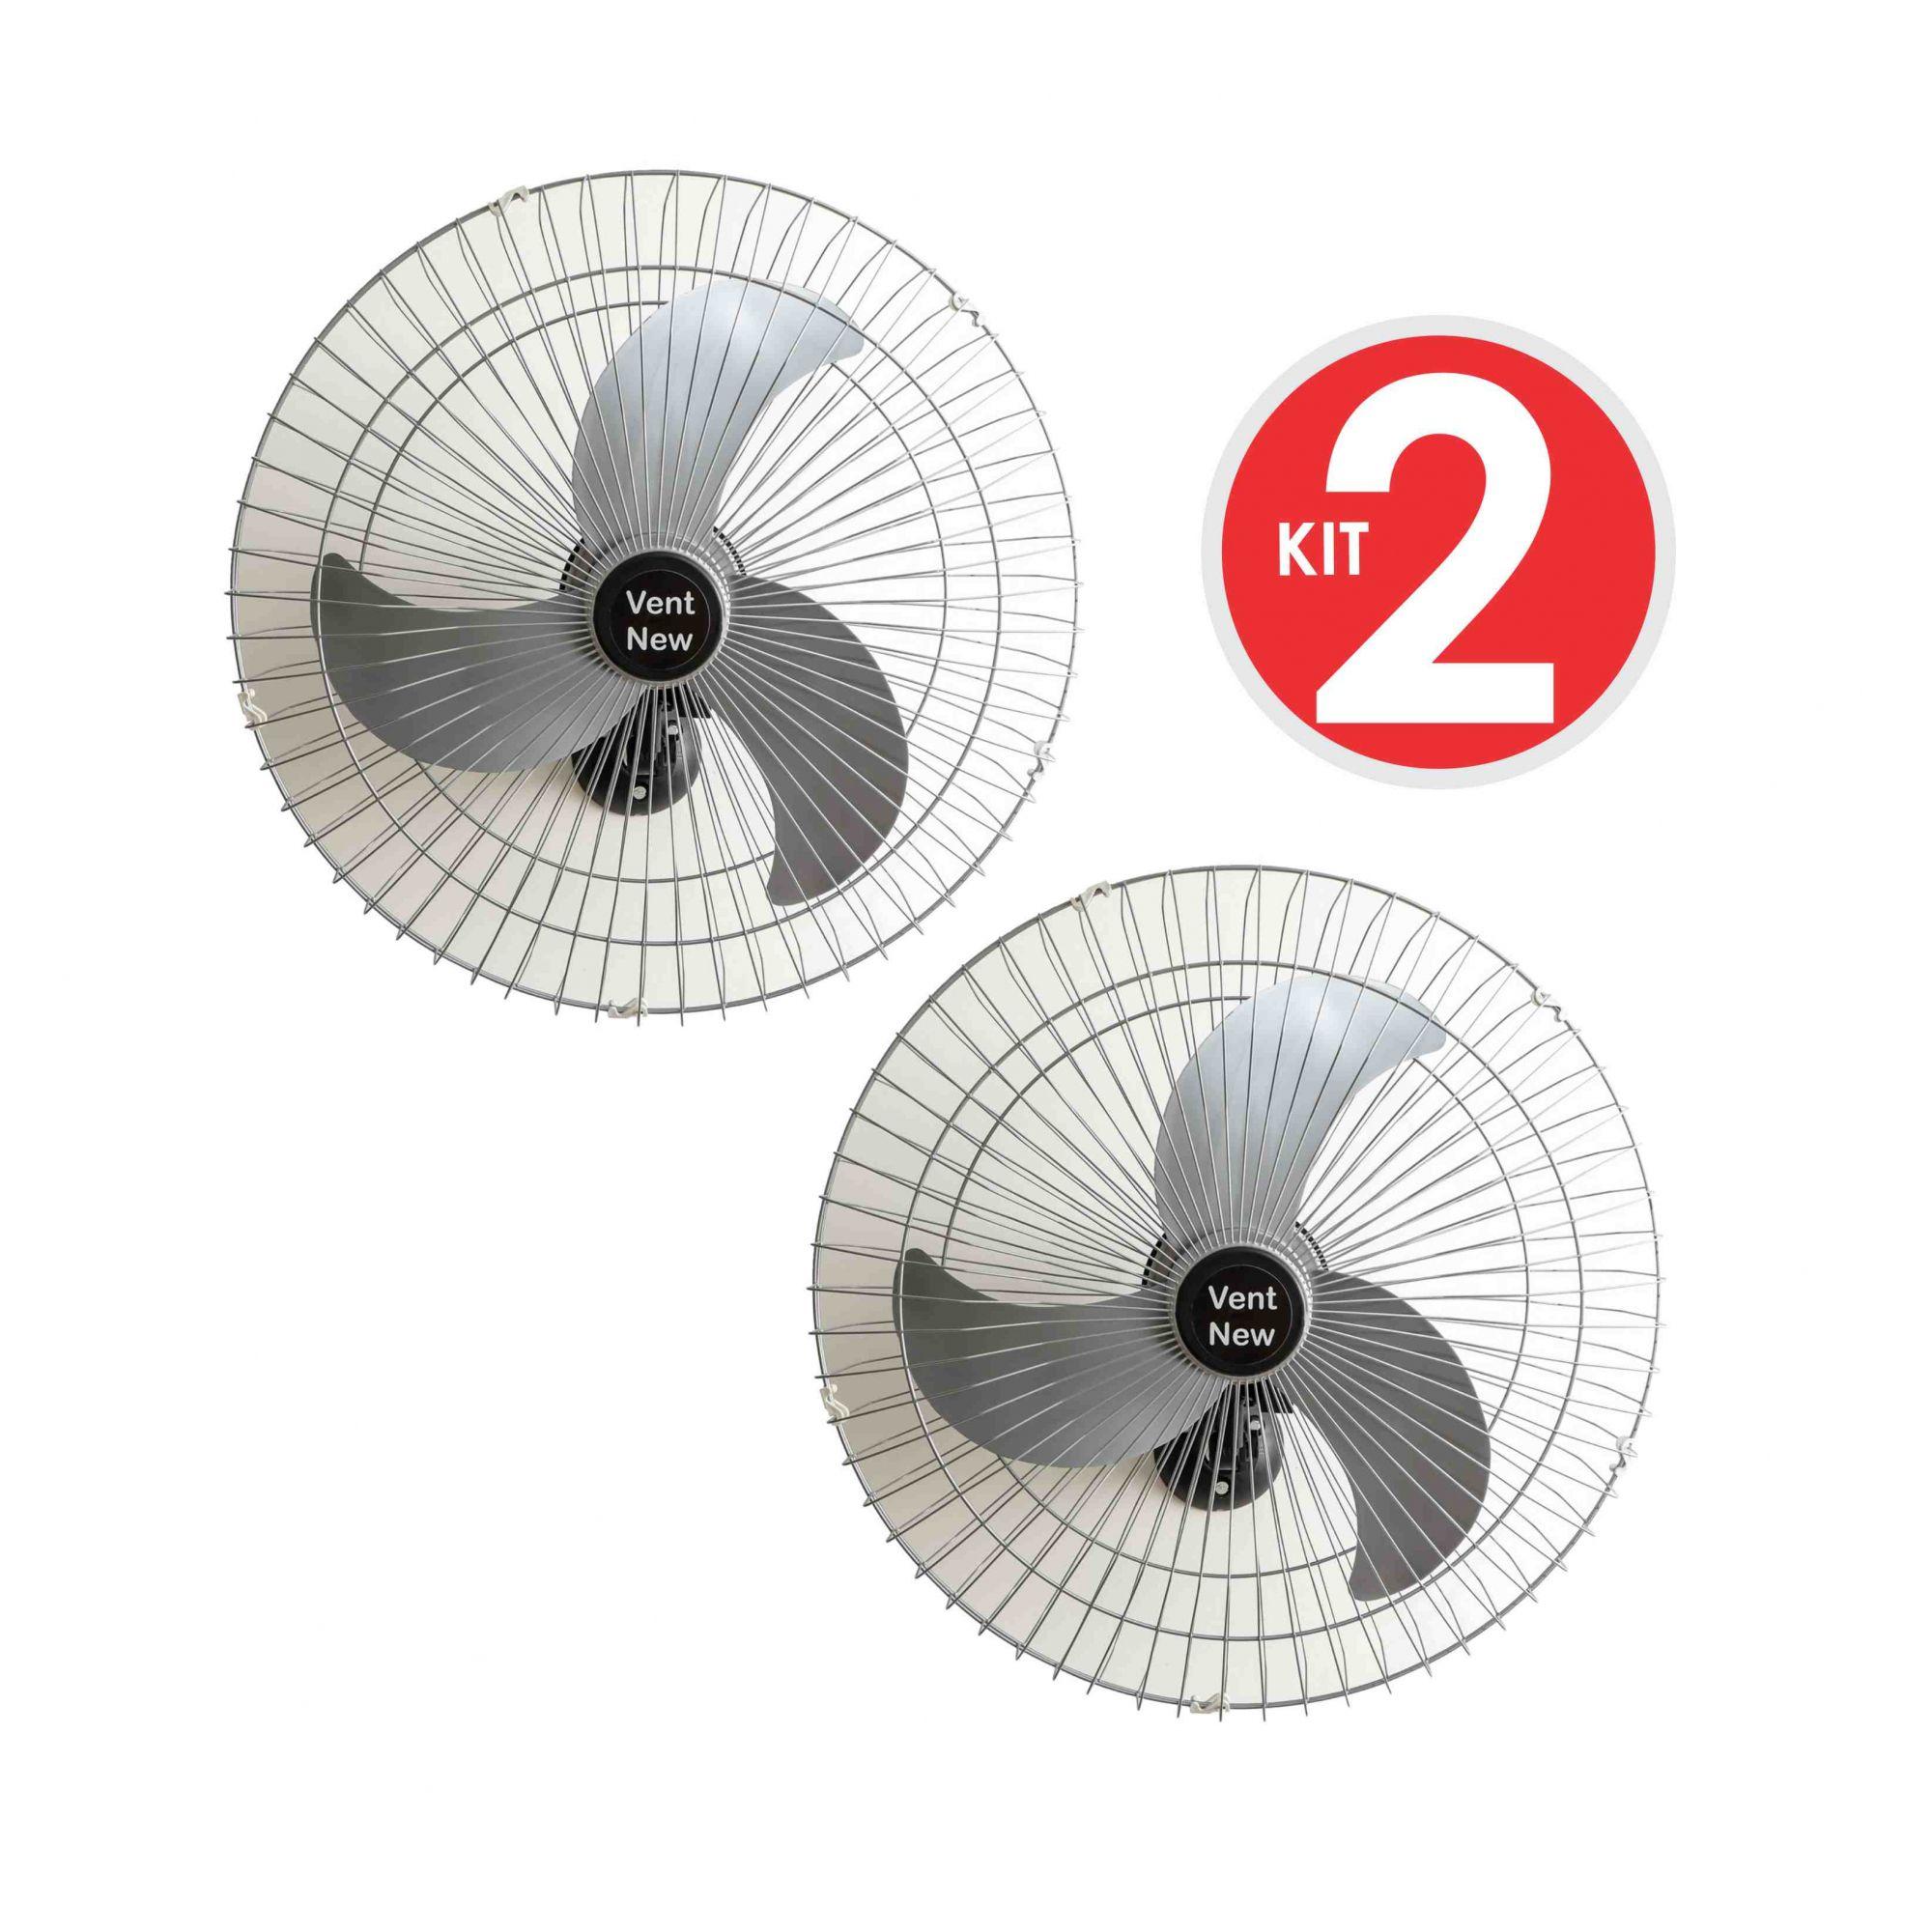 Kit 2 Ventiladores Parede Bivolt Prata Oscilante 60 Cm